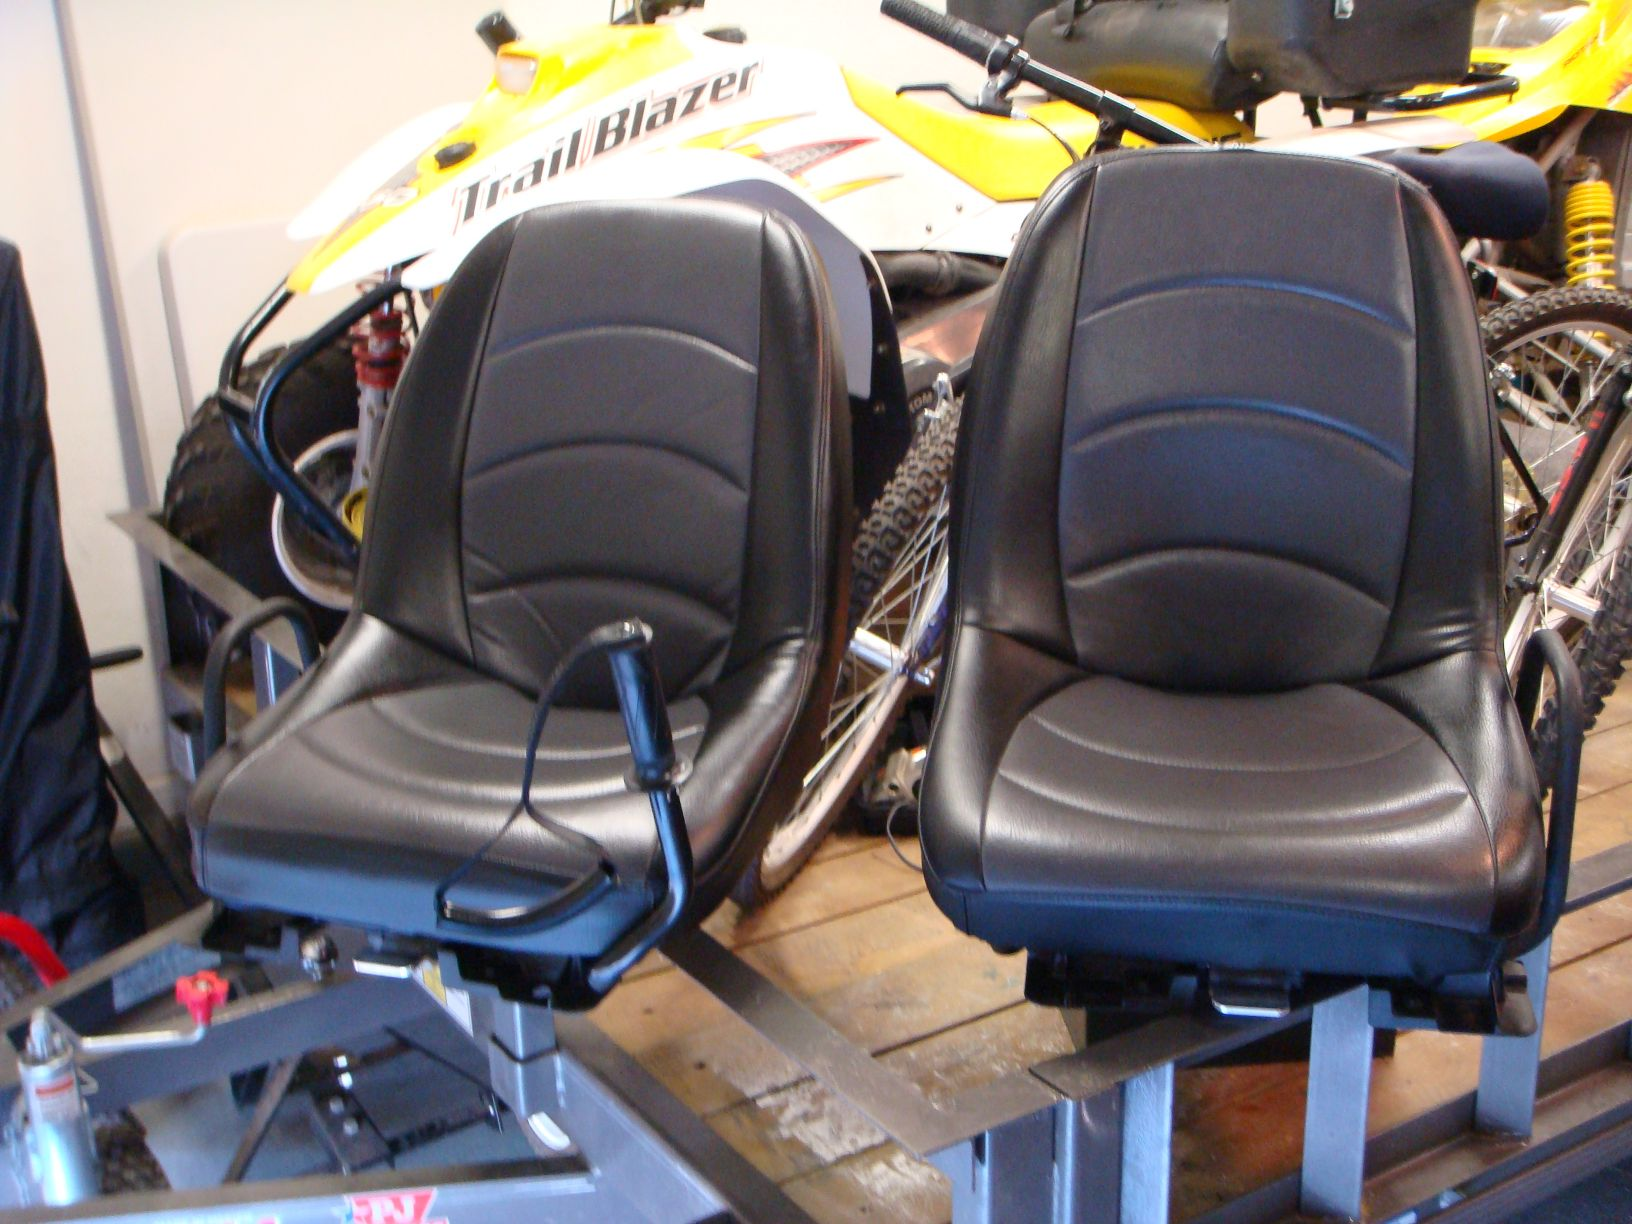 Renegade Seats Front Seat Covers 150 Yamaha Rhino